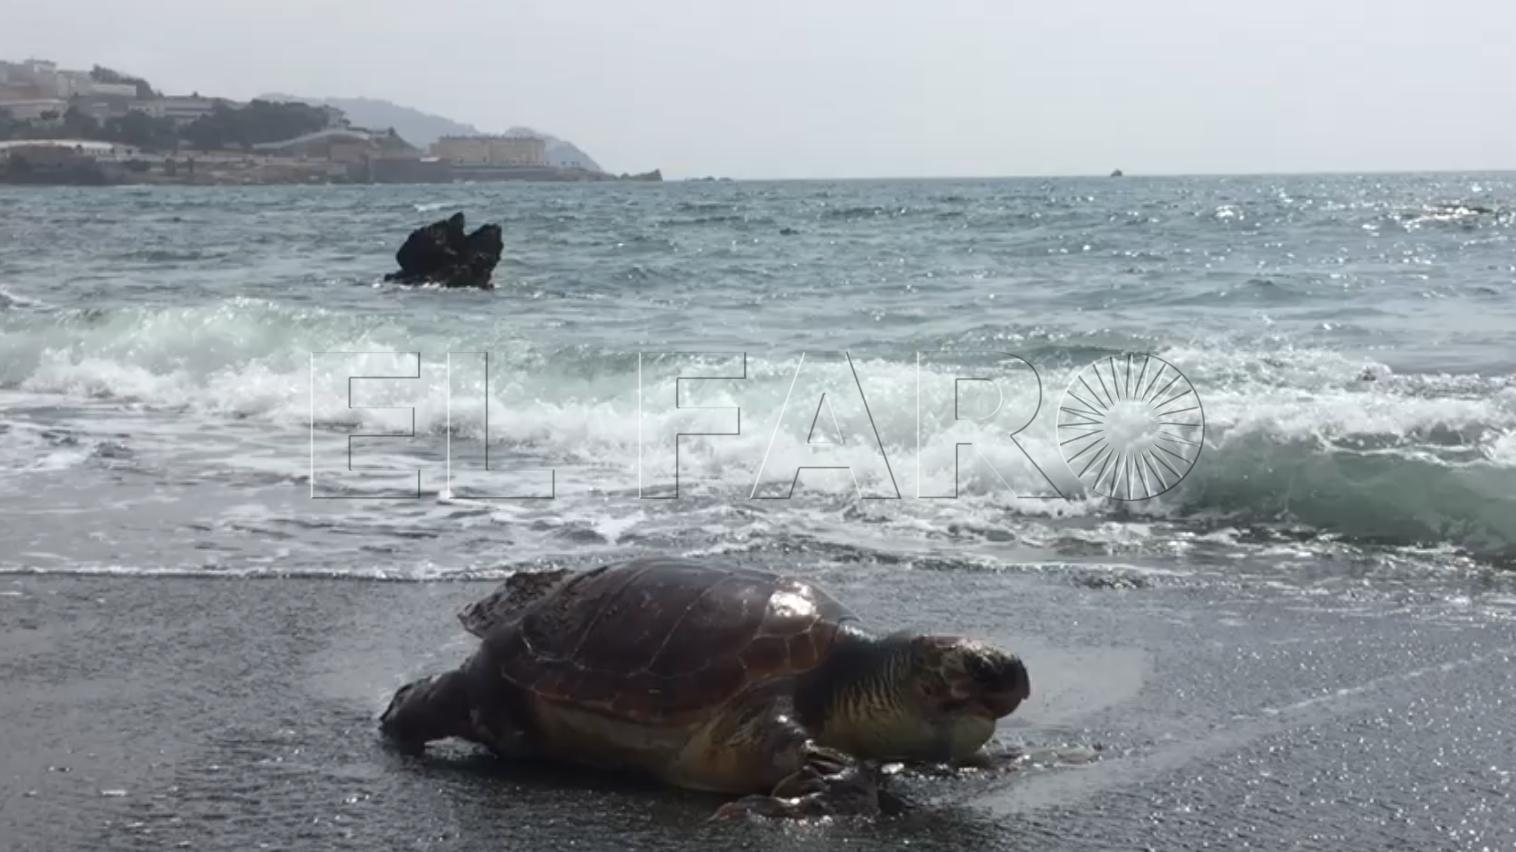 Aparece una tortuga muerta en la playa del Tarajal